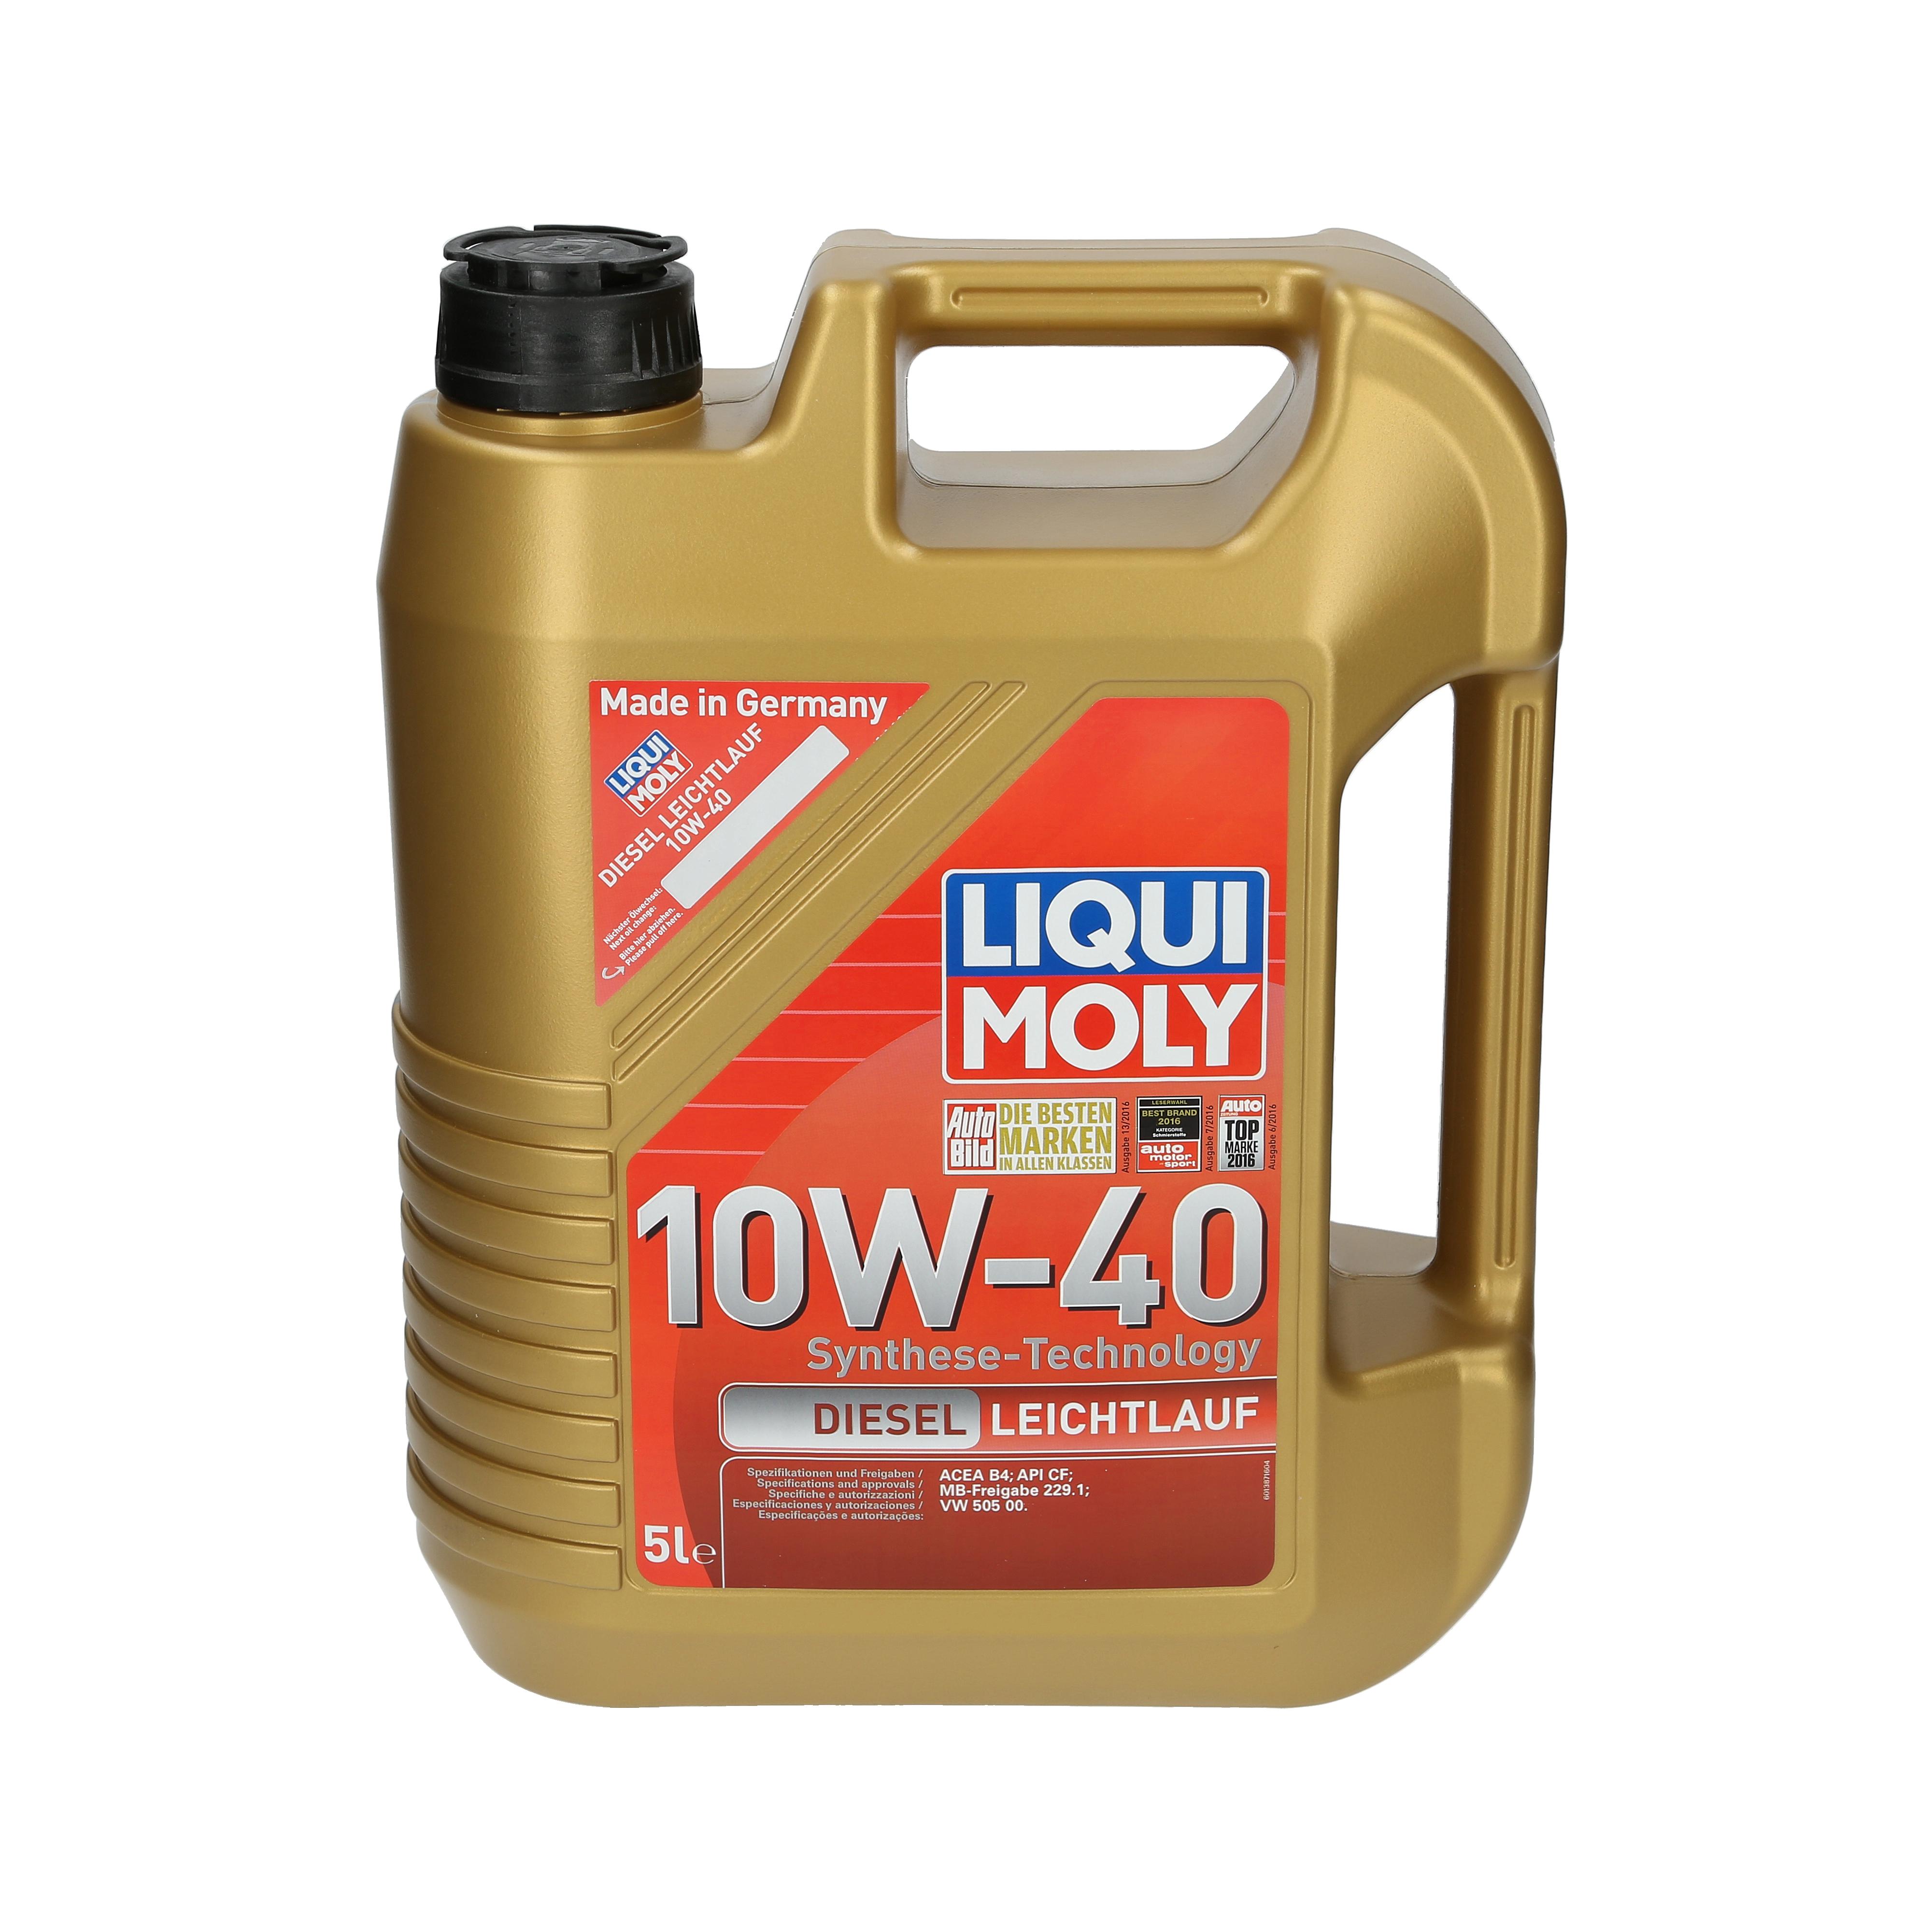 Motoröl ´Diesel Leichtlauf 10W-40 (5 L)´ | LIQUI MOLY (1387)